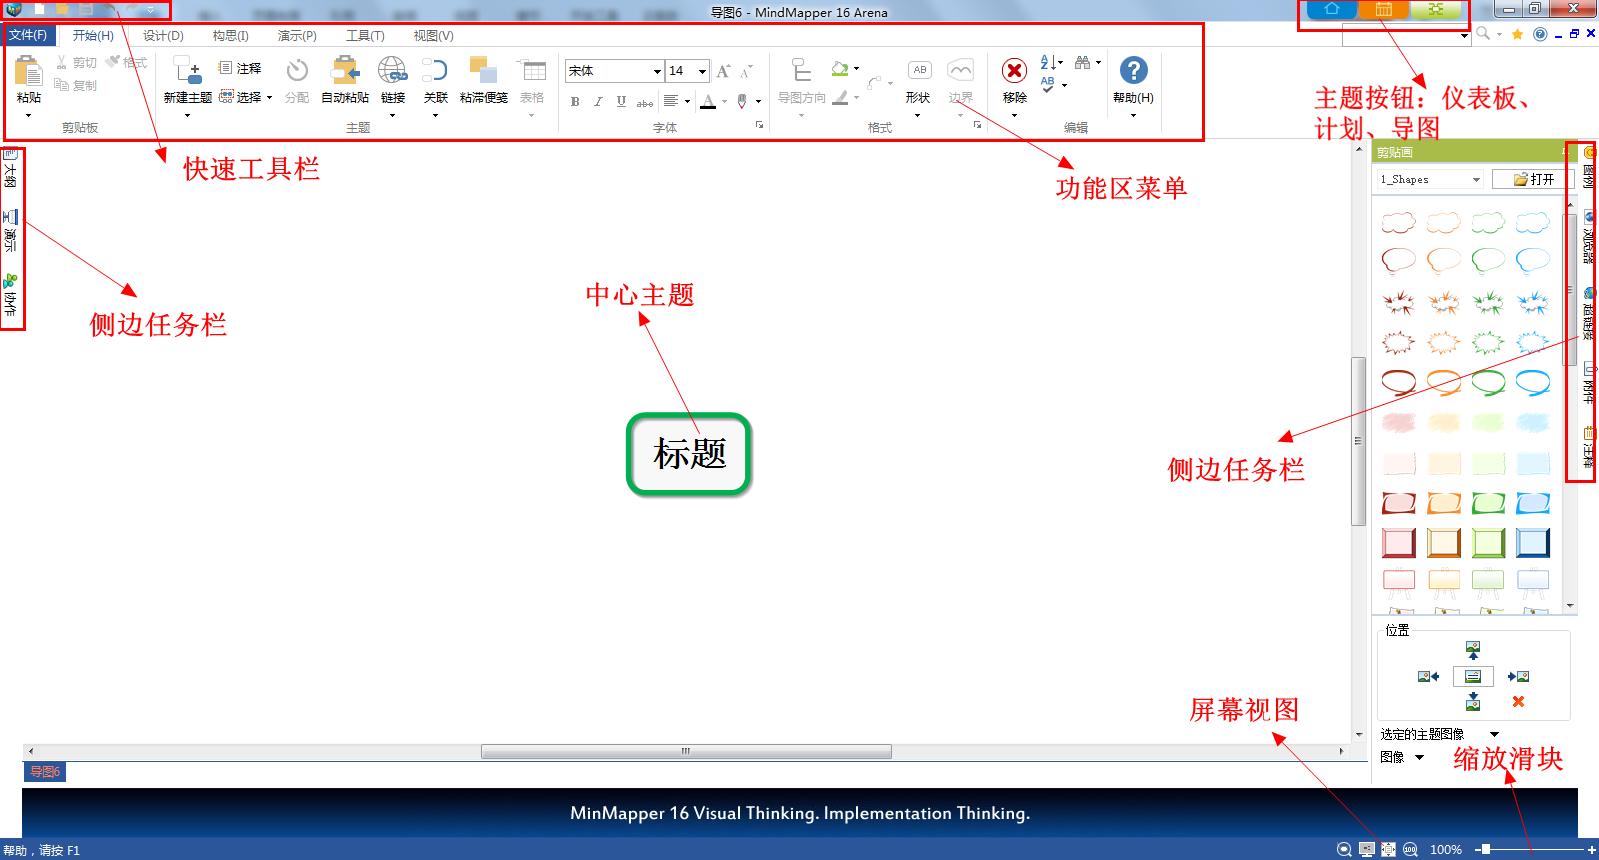 MindMapper主要操作区域